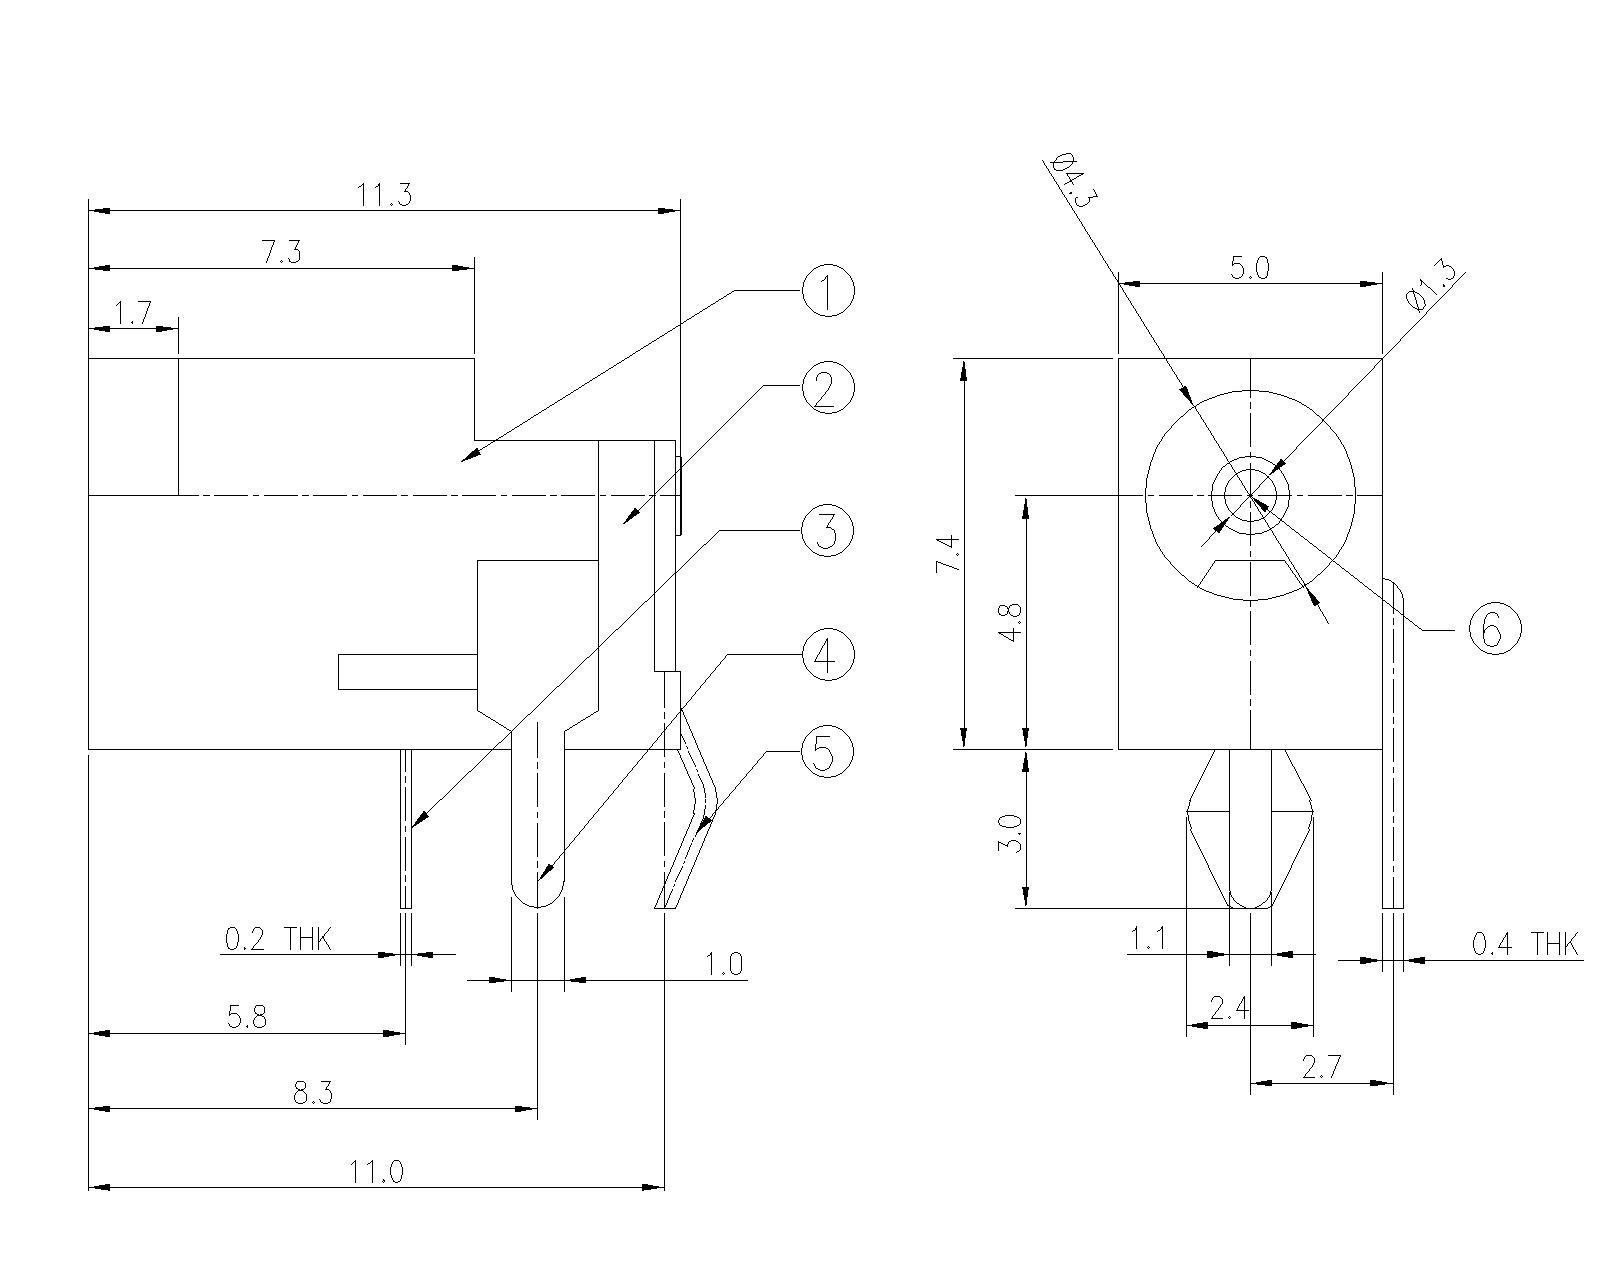 u00d82 0mm dc power jack with 1pin kink  right angle pdcj05